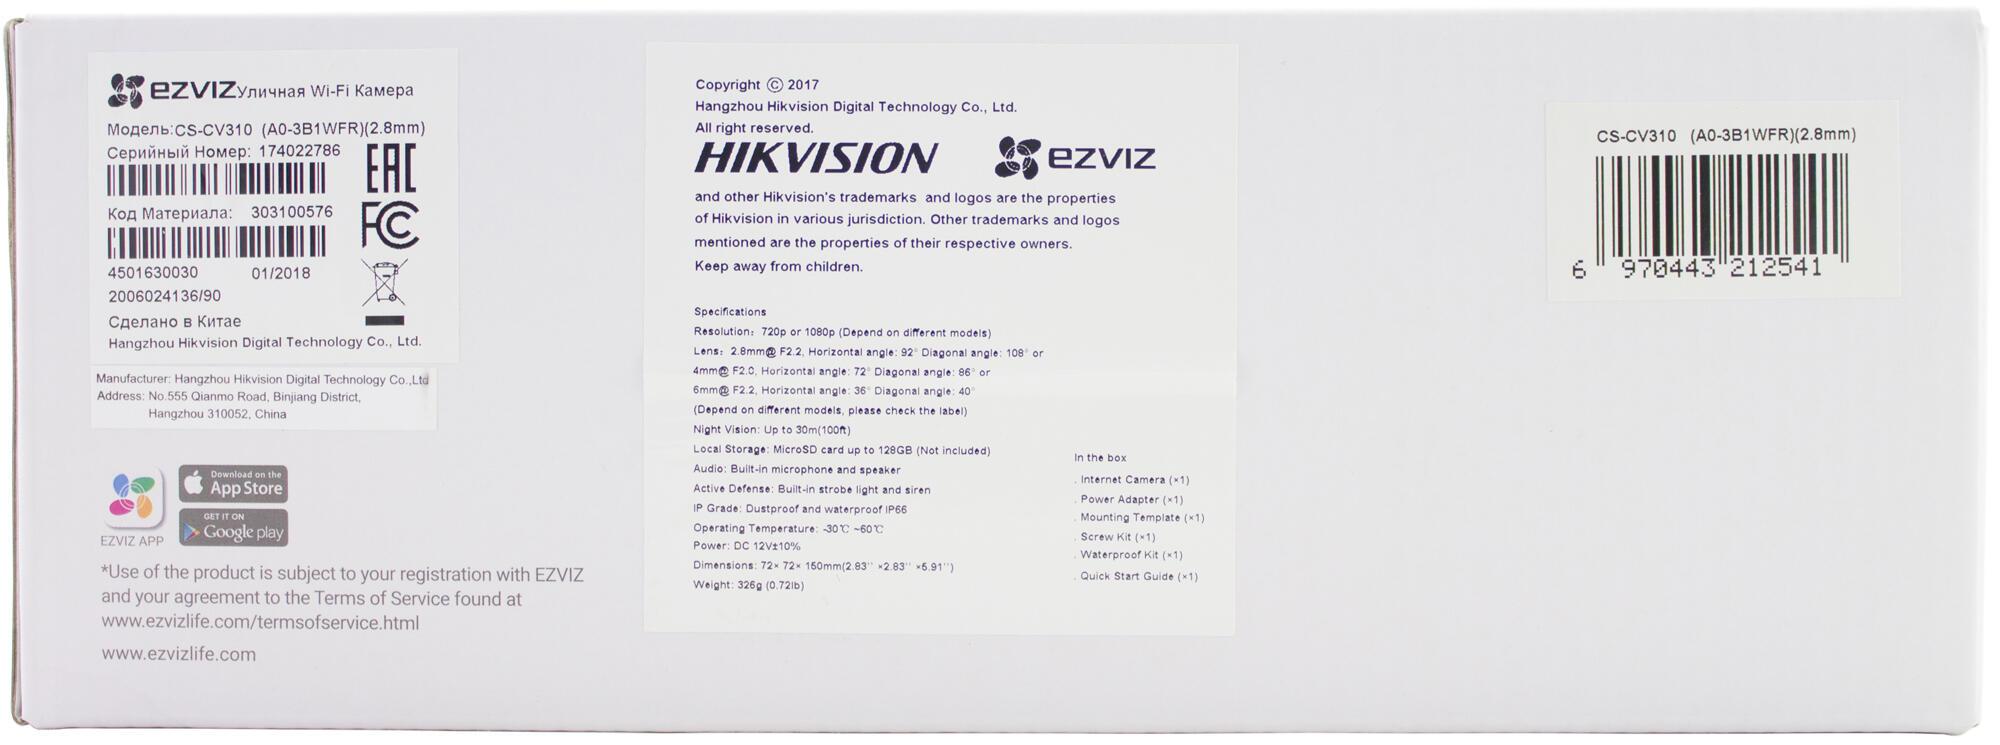 Setevoe oborudovanie - Obzor videokamer Ezviz Mini Trooper, ez360, Mini Plus, Husky Air.